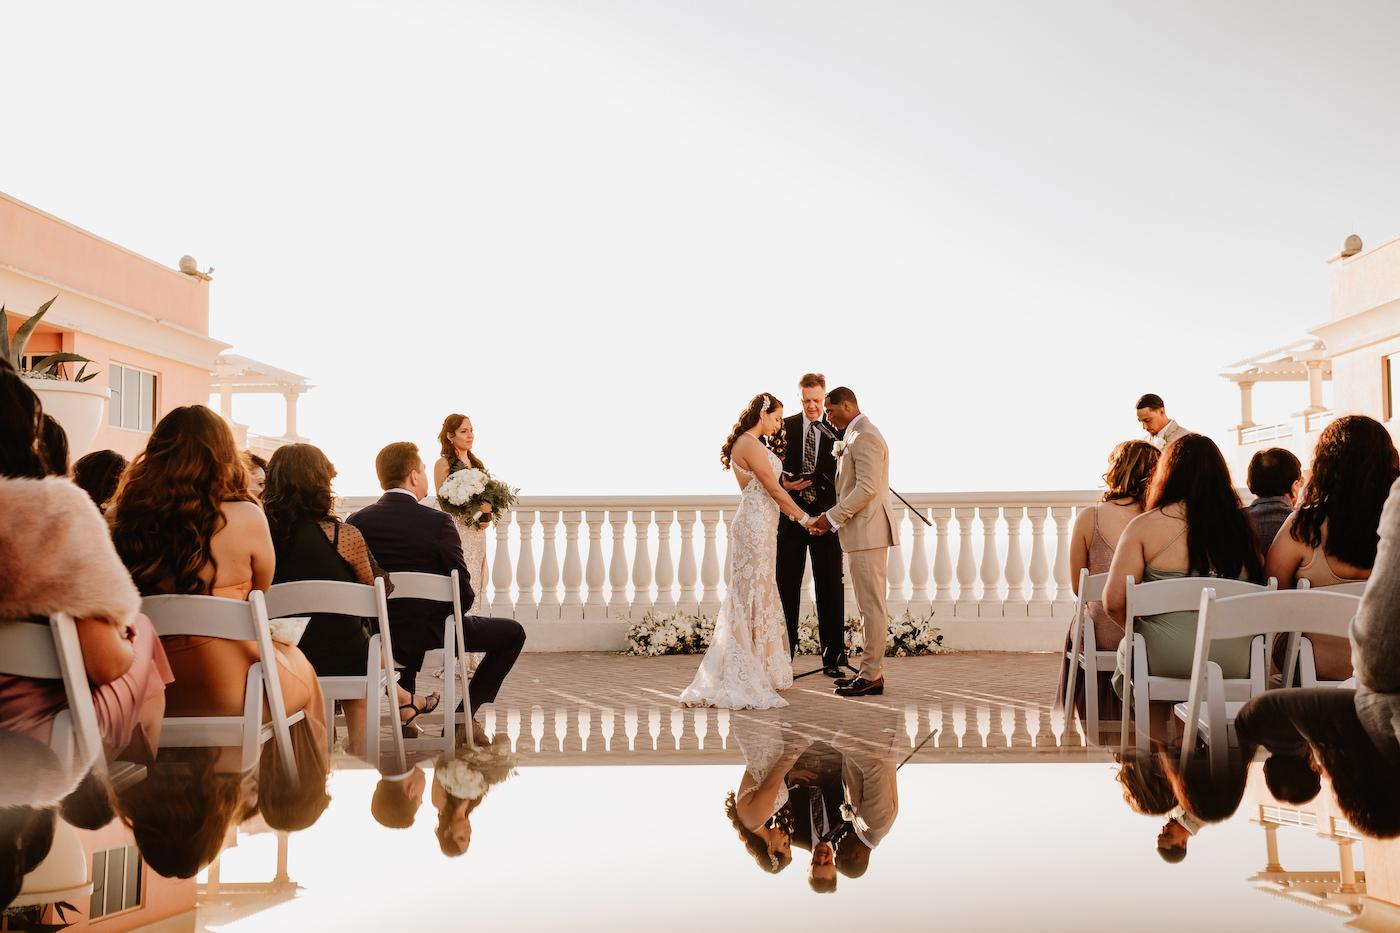 Clearwater Wedding Venue Hyatt Regency Beach Hotel   Outdoor Rooftop Waterfront Wedding Ceremony with White Garden Chairs